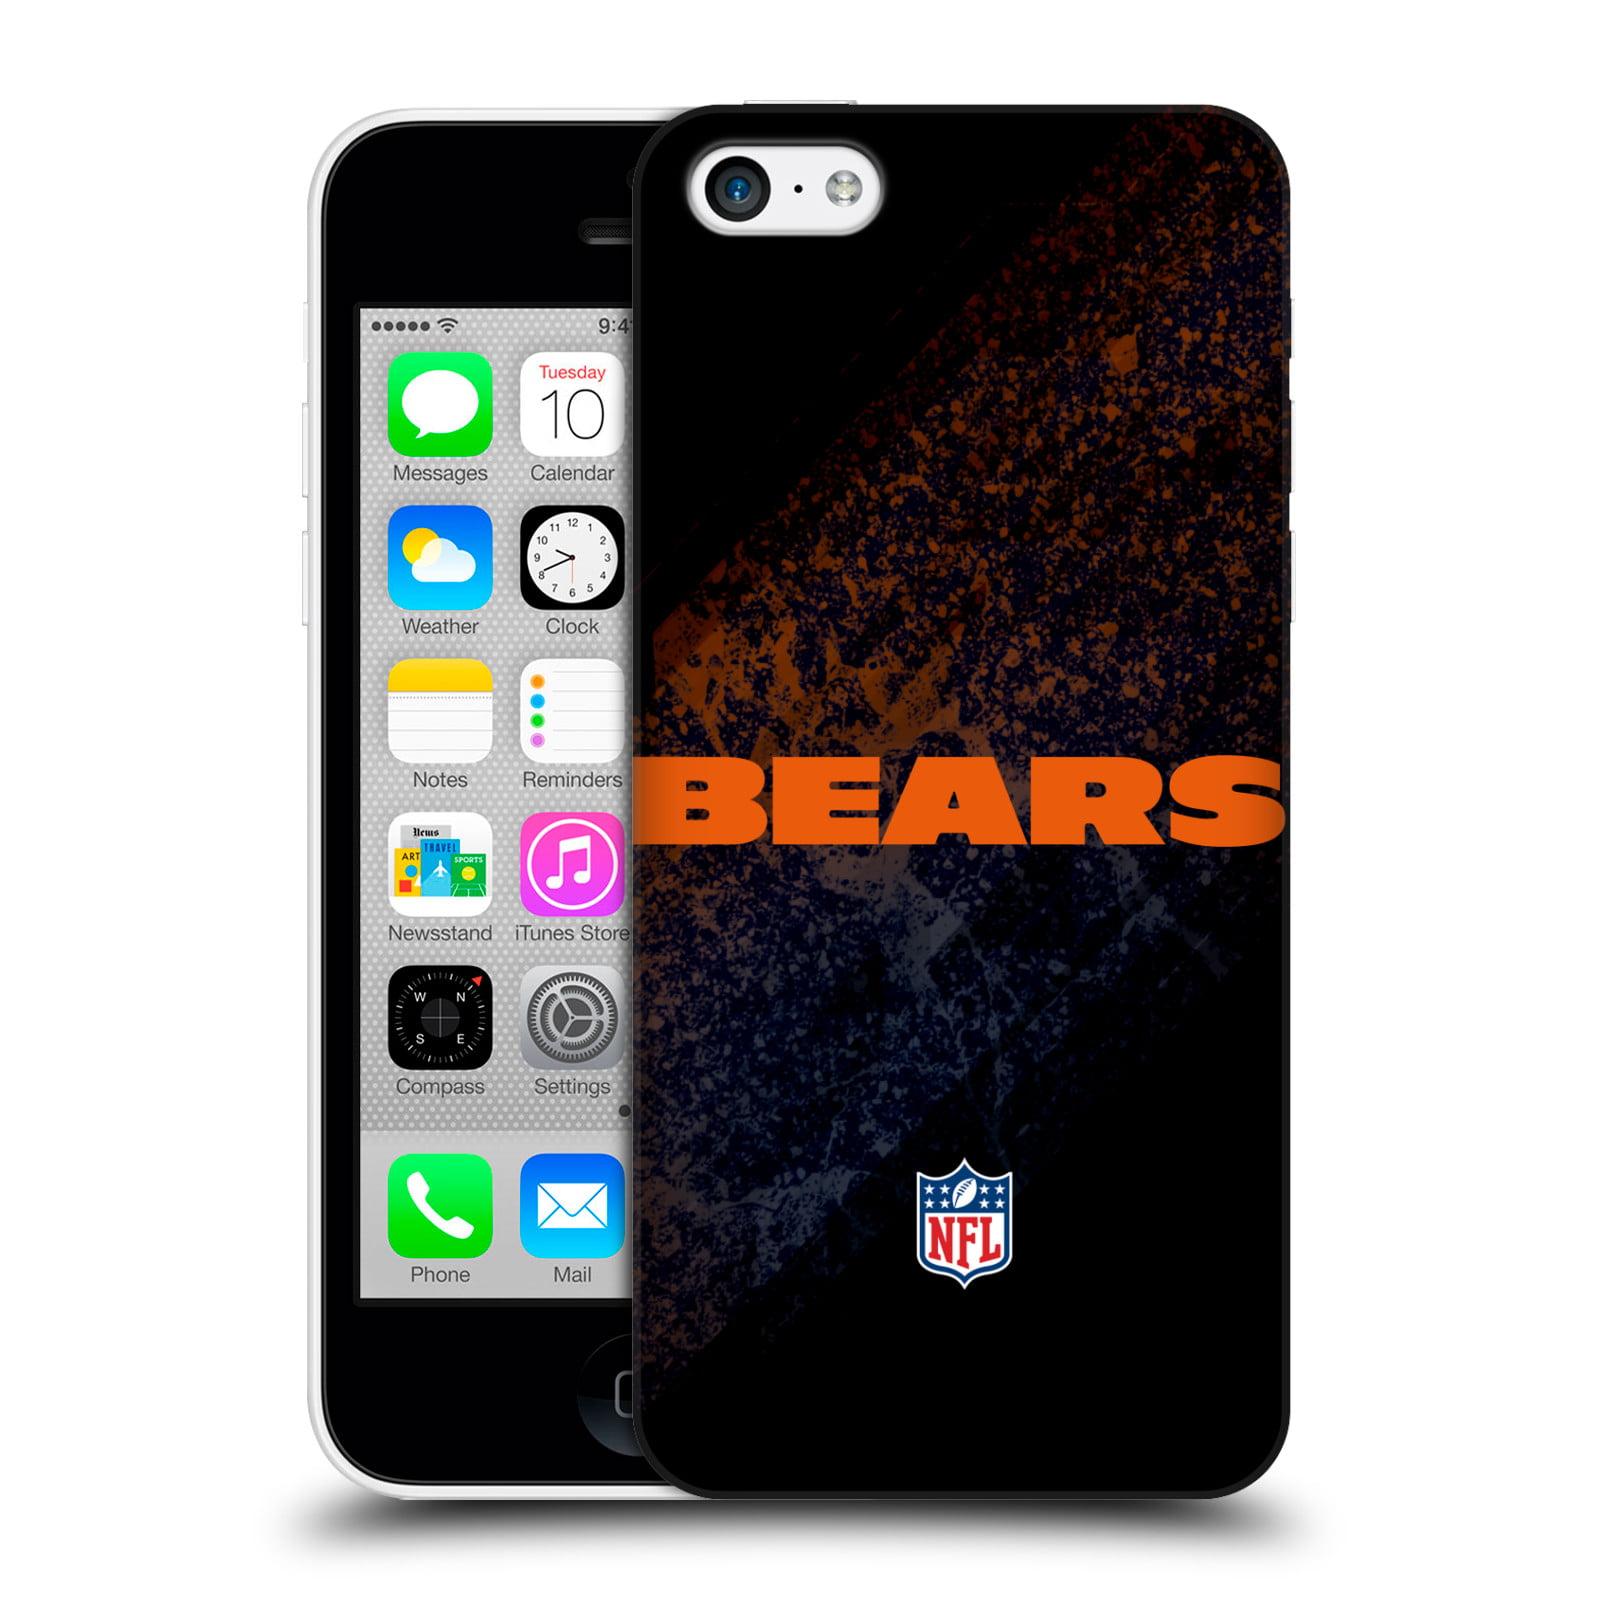 OFFICIAL NFL CHICAGO BEARS LOGO HARD BACK CASE FOR APPLE IPHONE PHONES